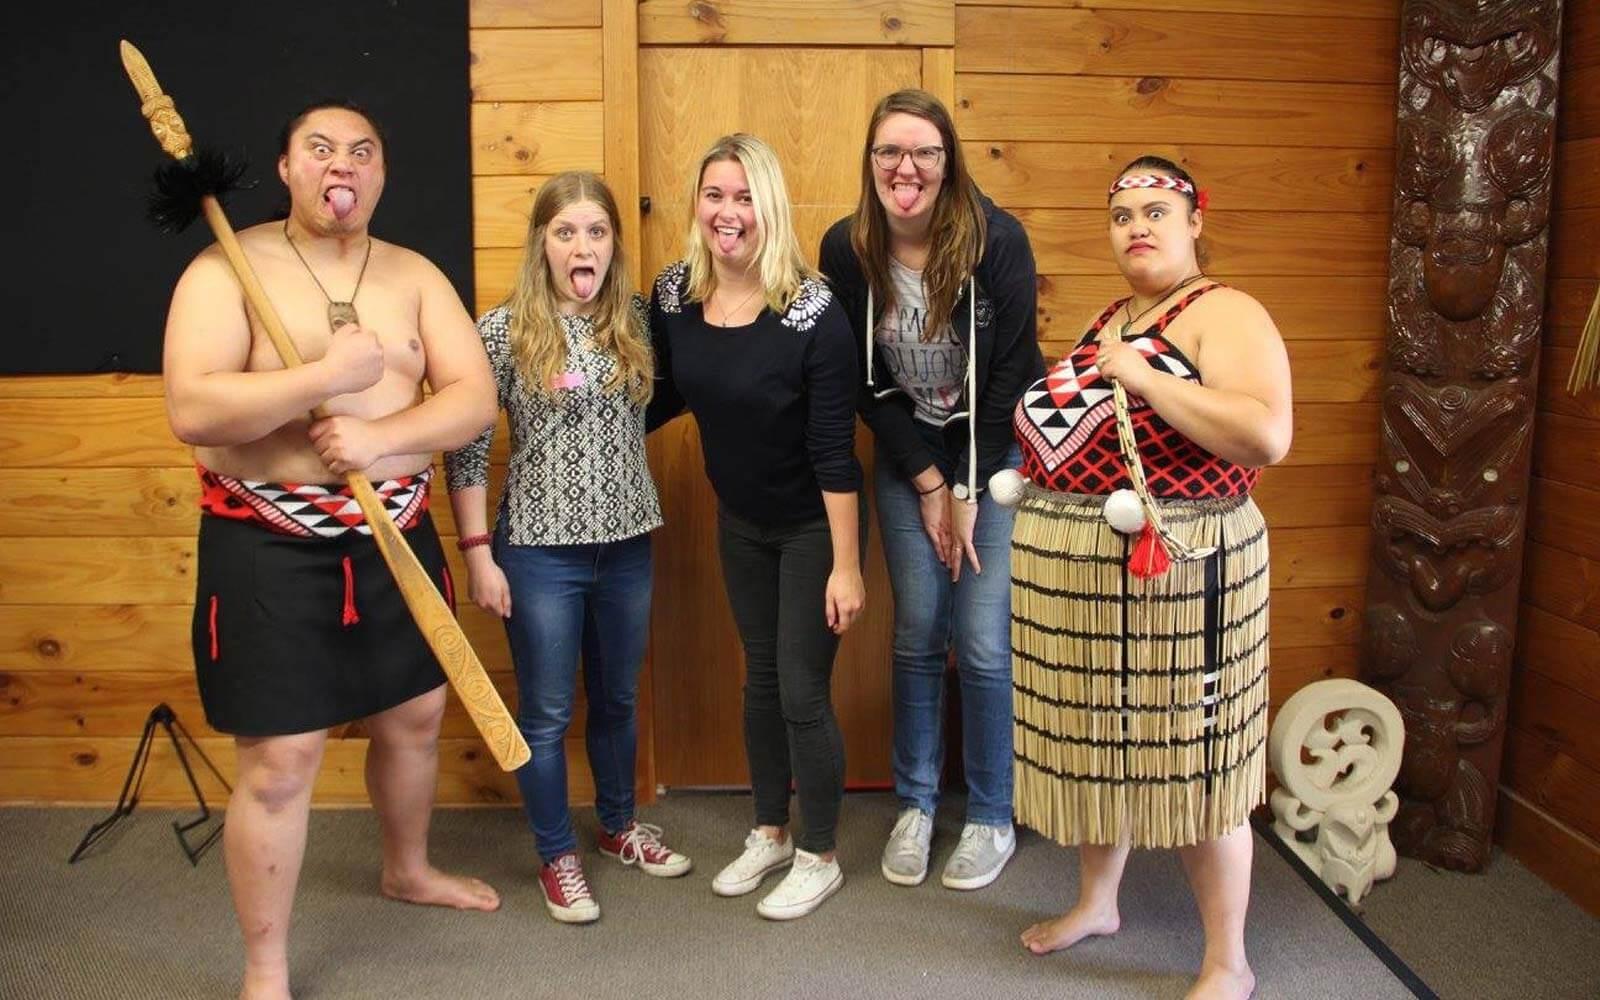 Maori-Gruppenfoto